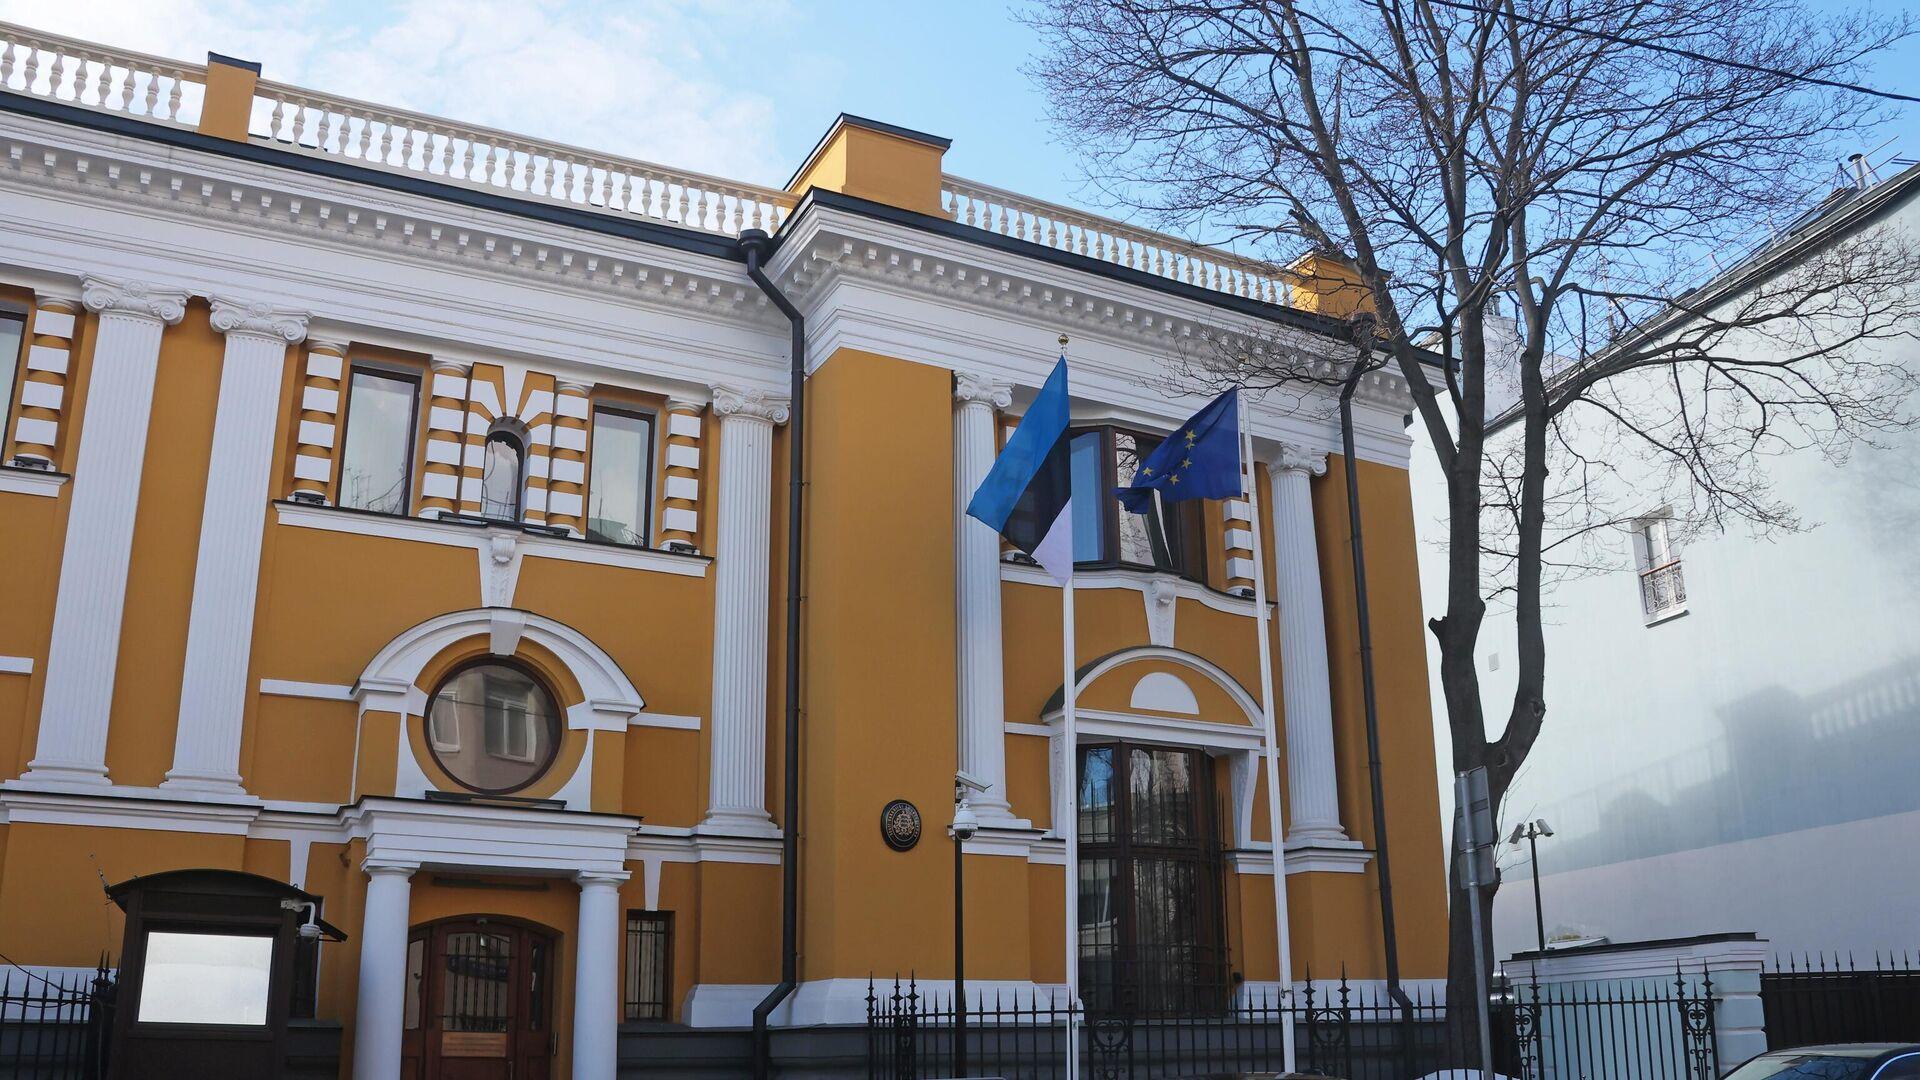 Zgrada estonske ambasade u Moskvi - Sputnik Srbija, 1920, 08.09.2021